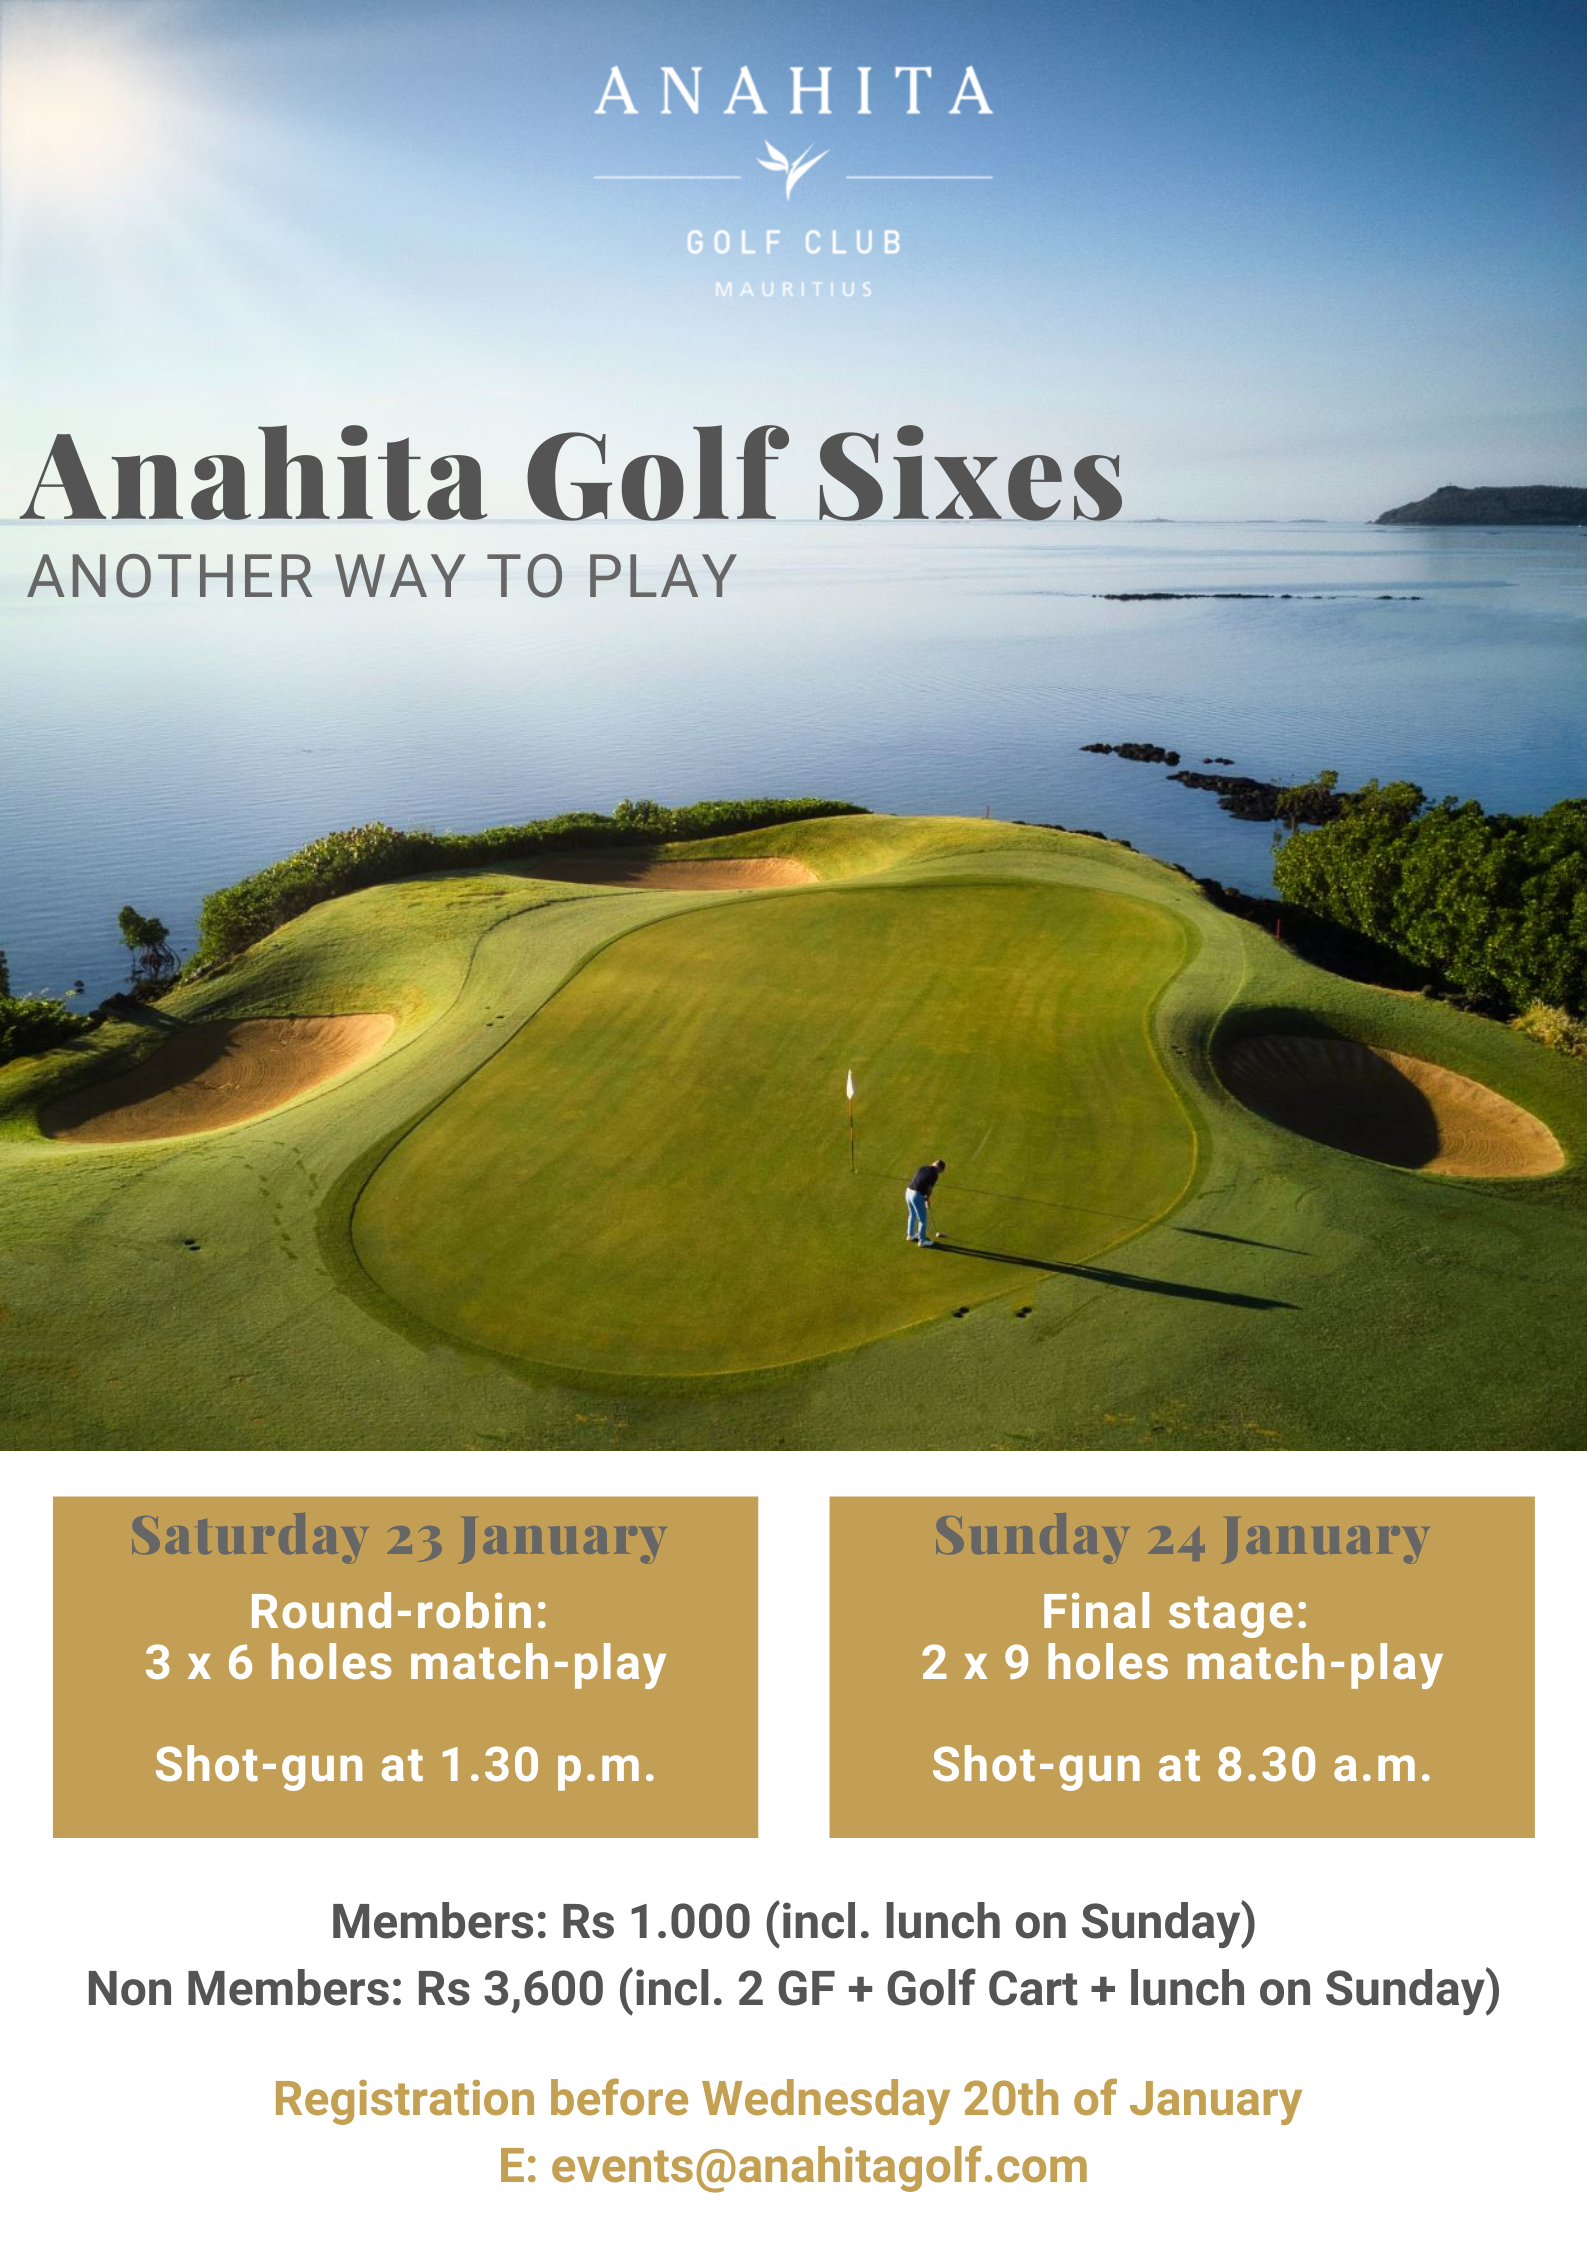 Anahita Golf Sixes